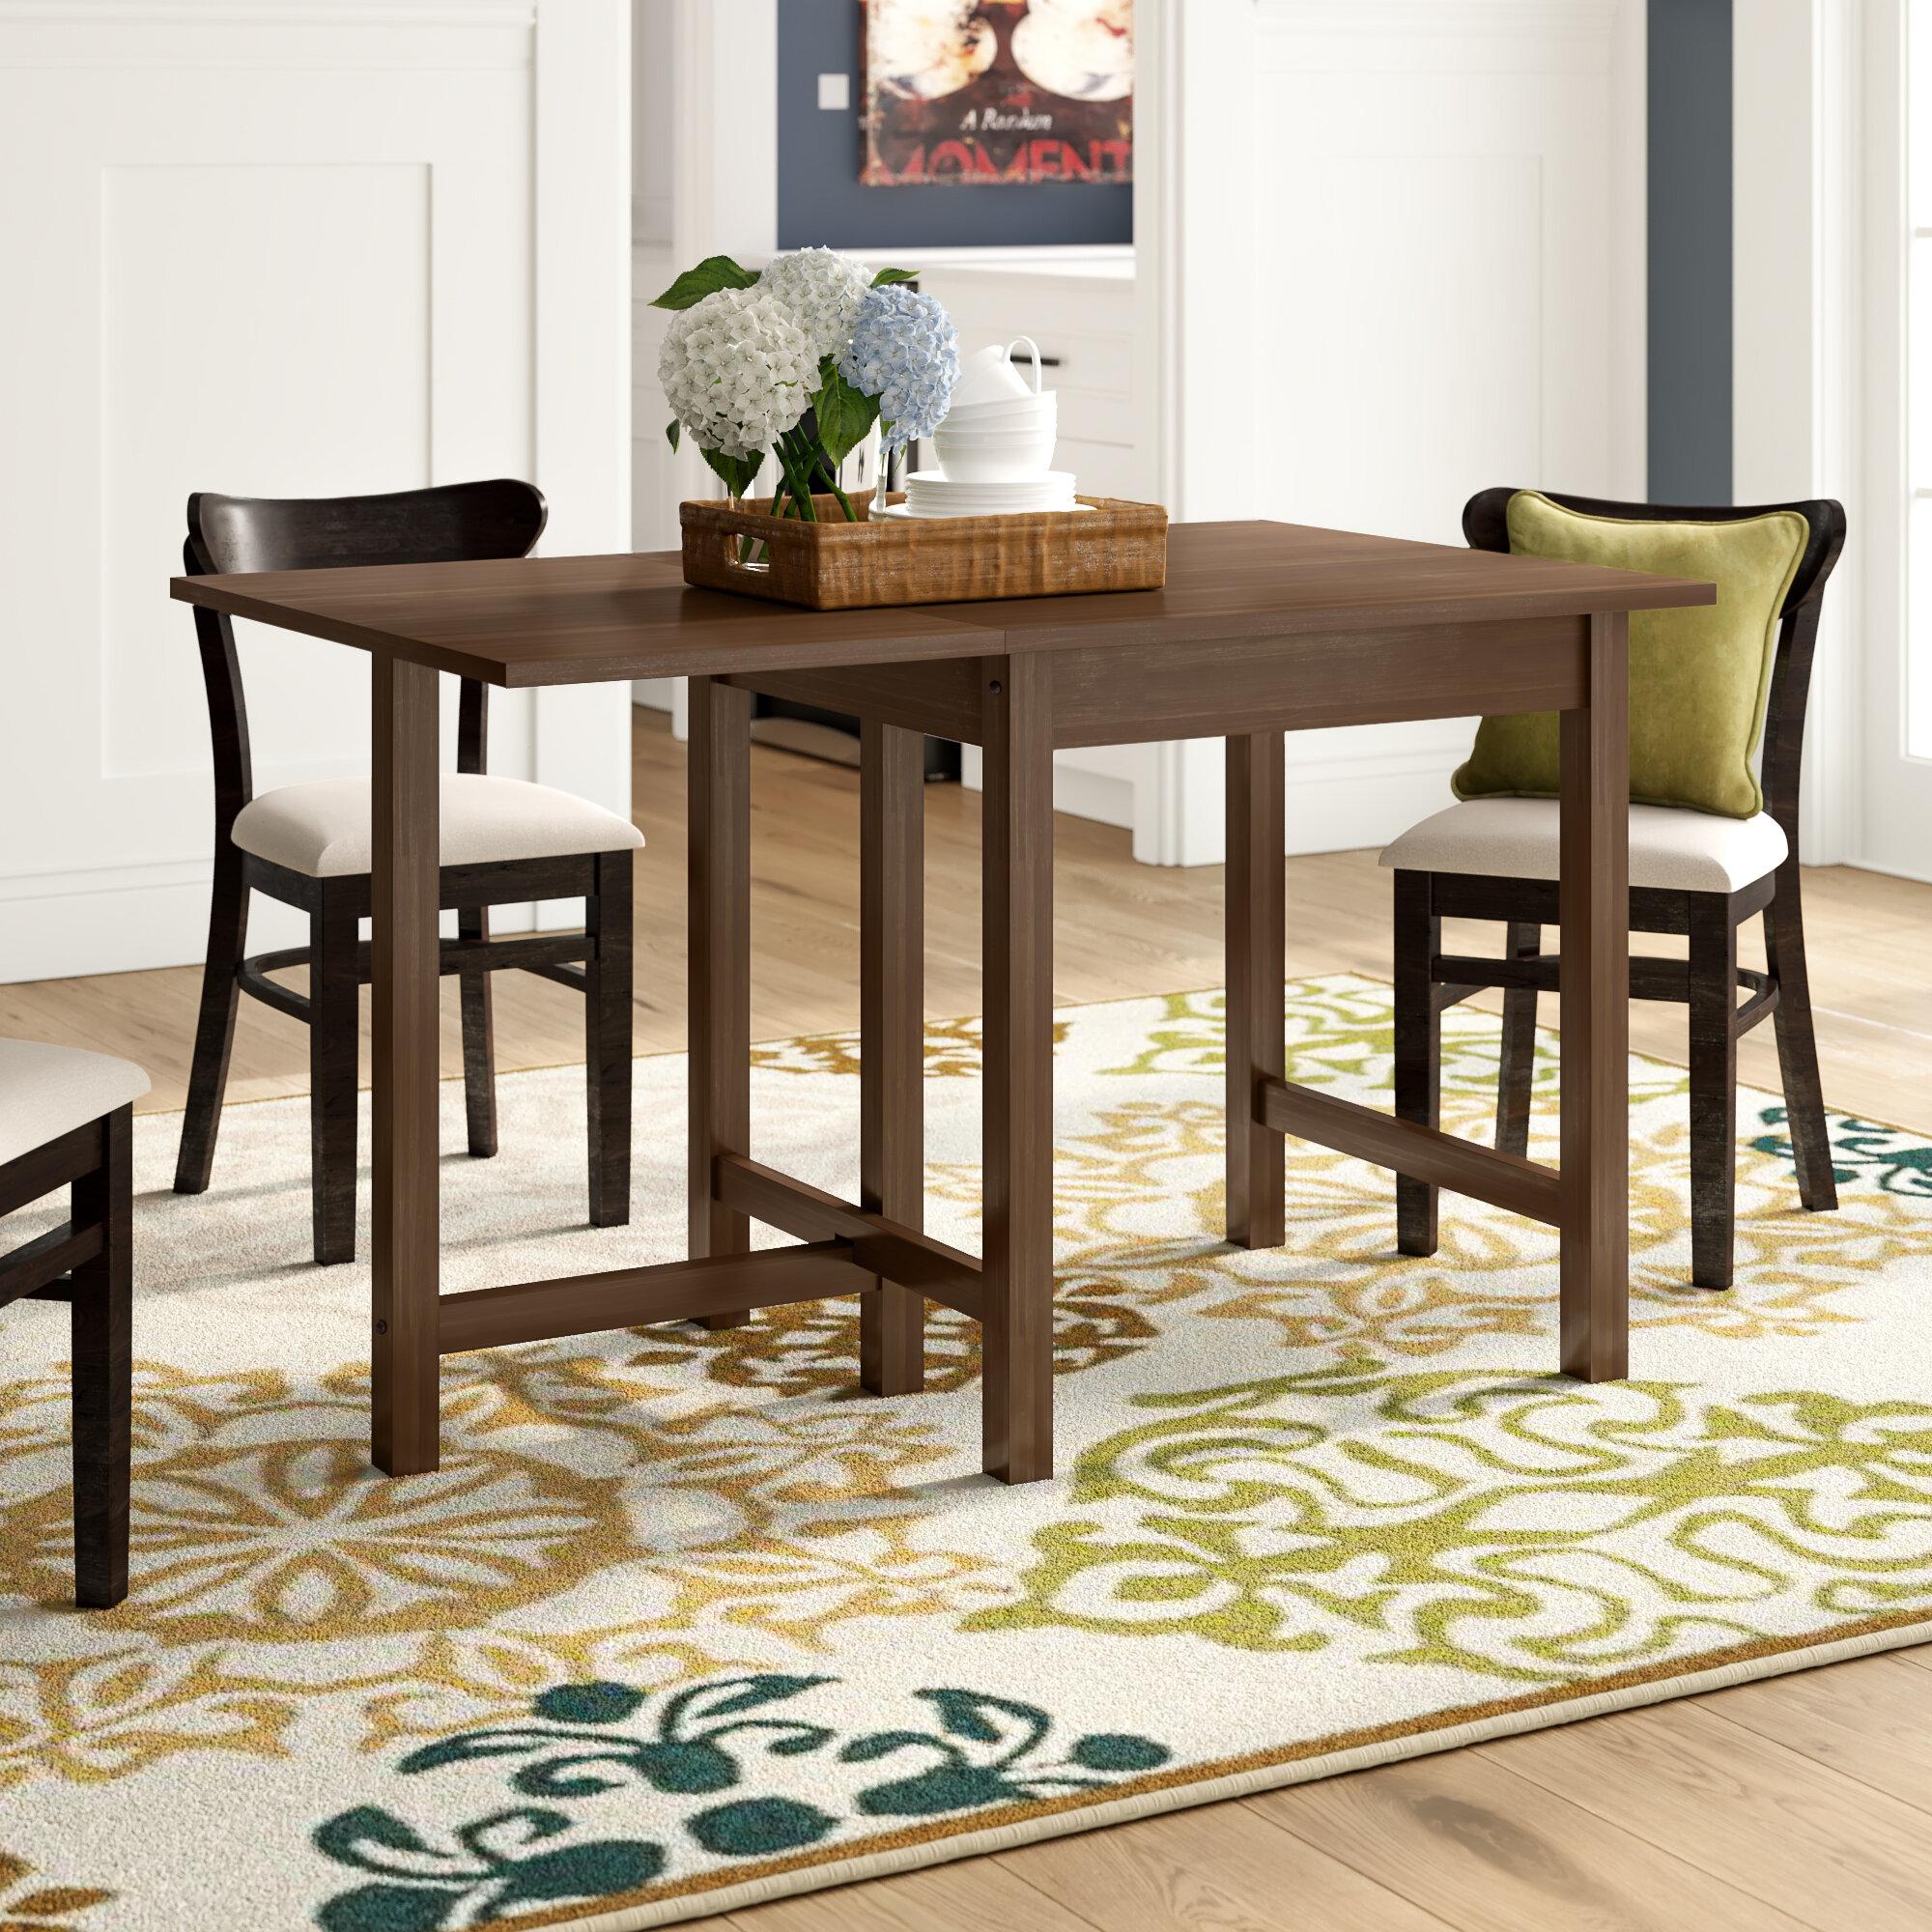 Red Barrel Studio Torrance Extendable Dining Table & Reviews | Wayfair